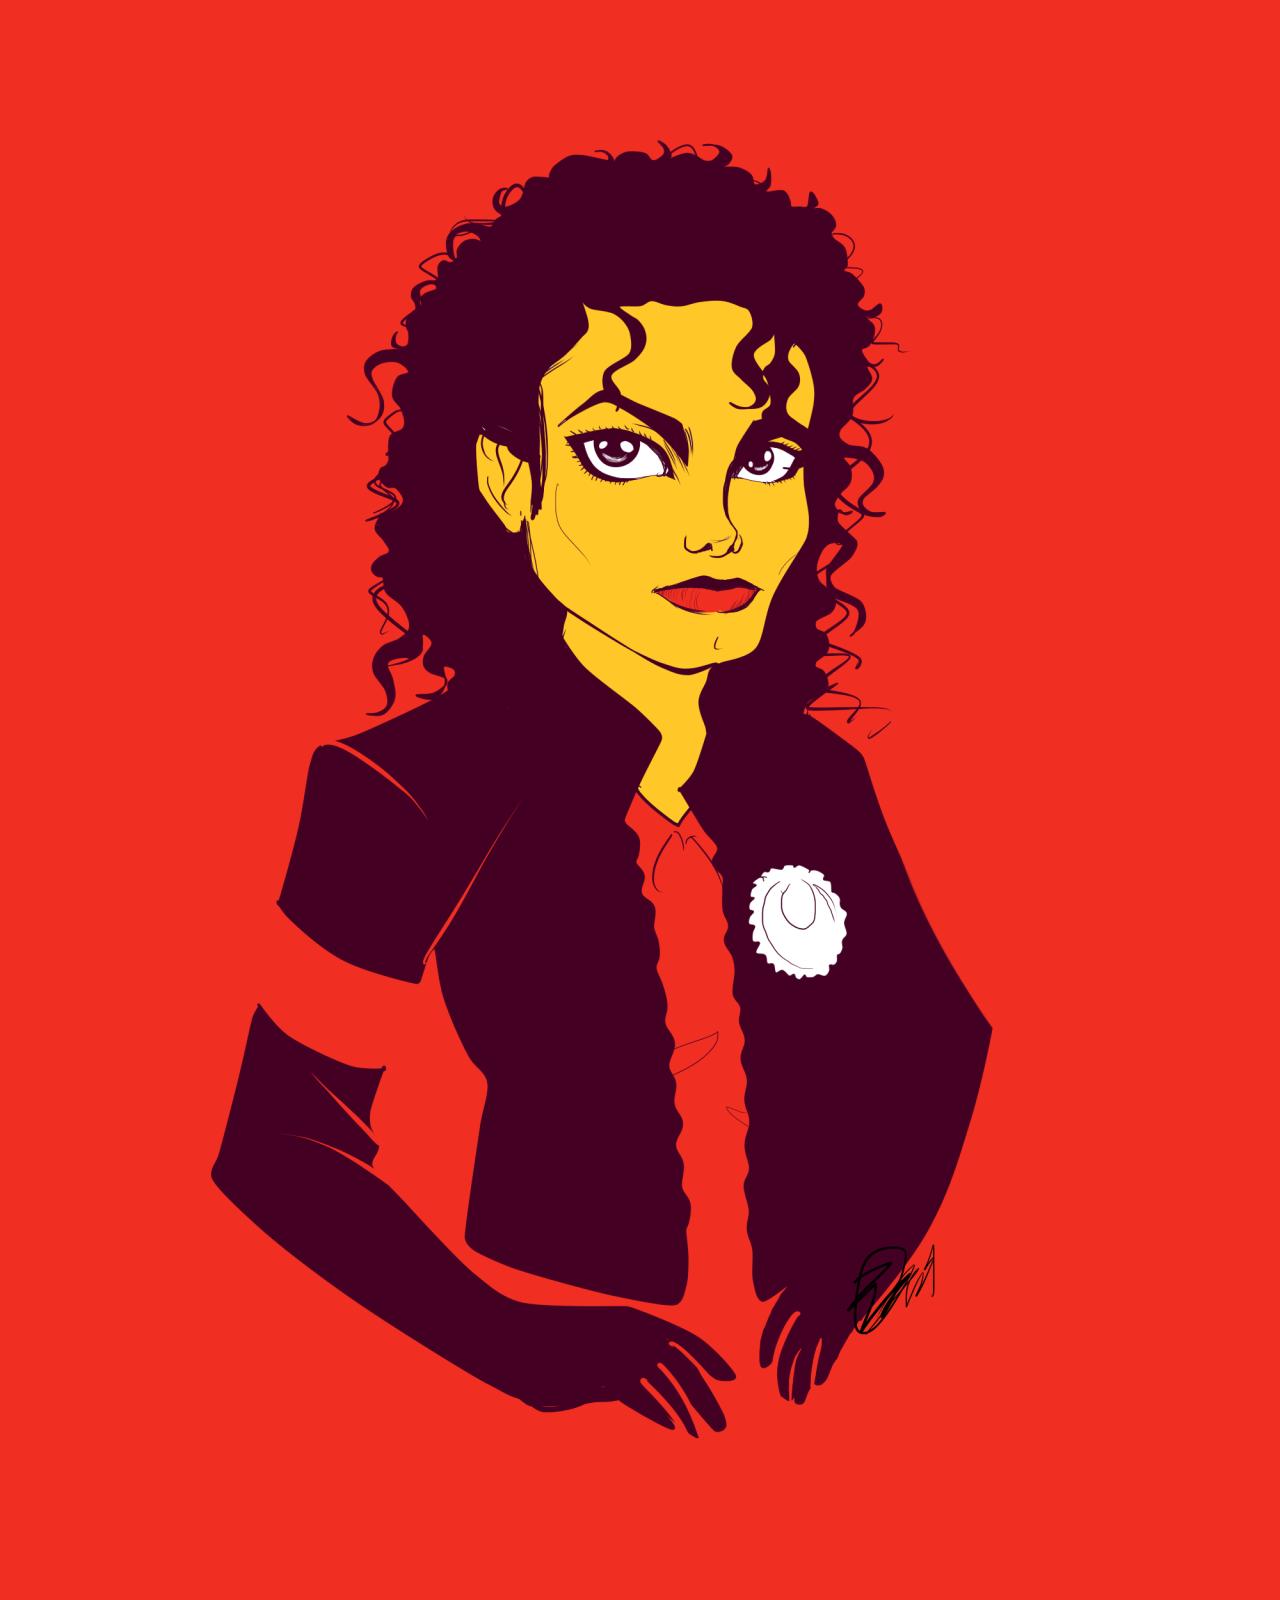 Michael Modo Artistico - Pagina 2 Tumblr_ngx6z8m9oN1r4jws4o1_1280